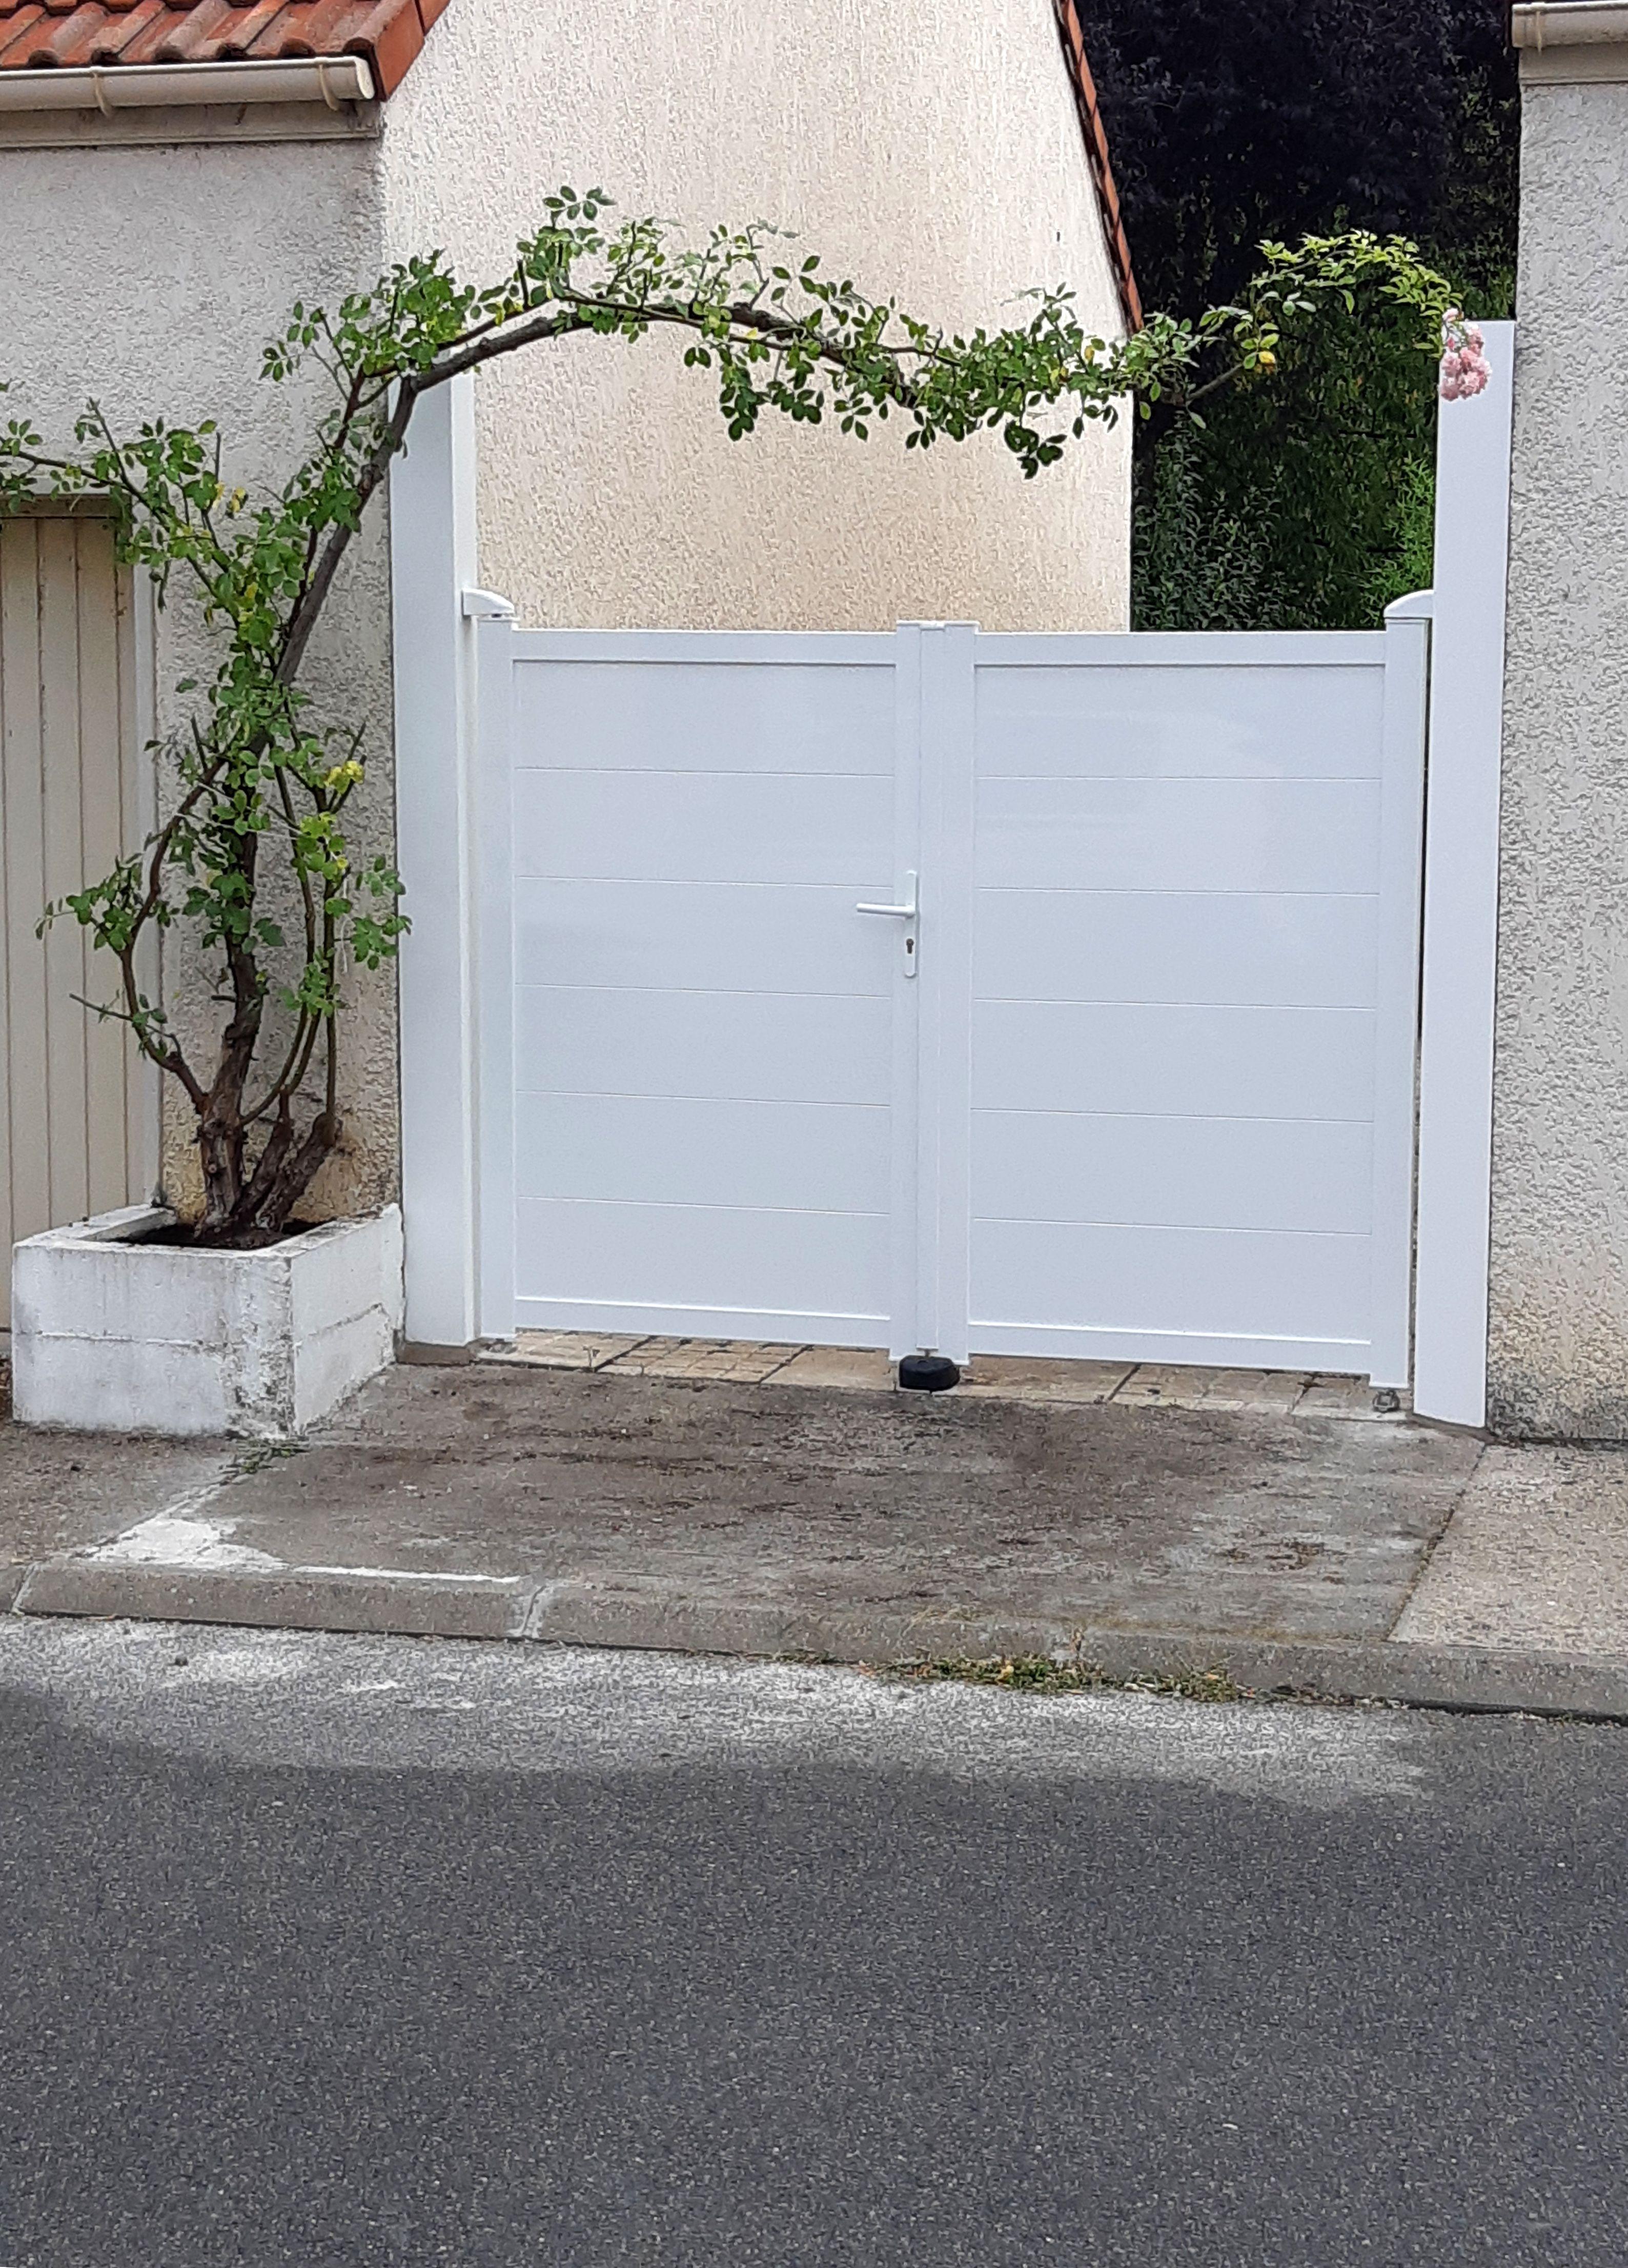 Claustra Alu Leroy Merlin portail alu essia | portail alu, portail, portail aluminium